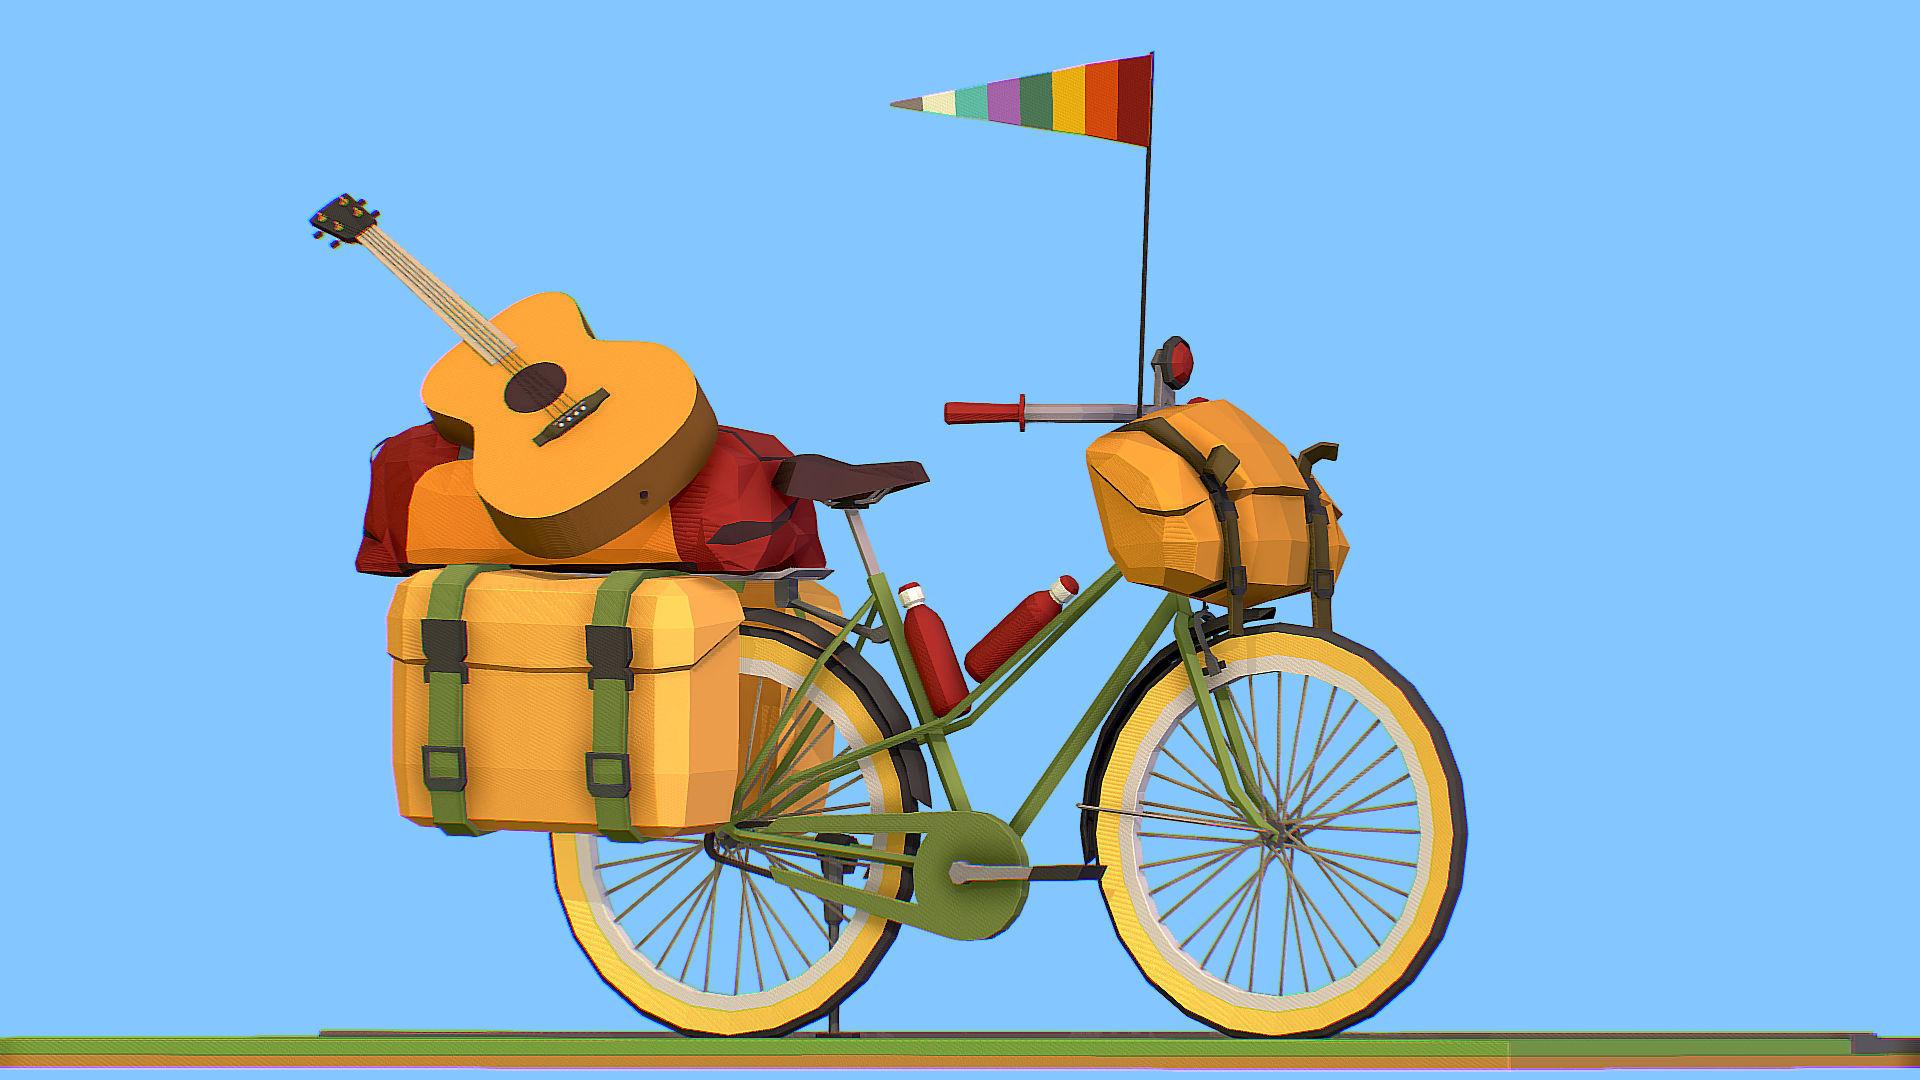 isometric art lowpoly model tourist bike ride